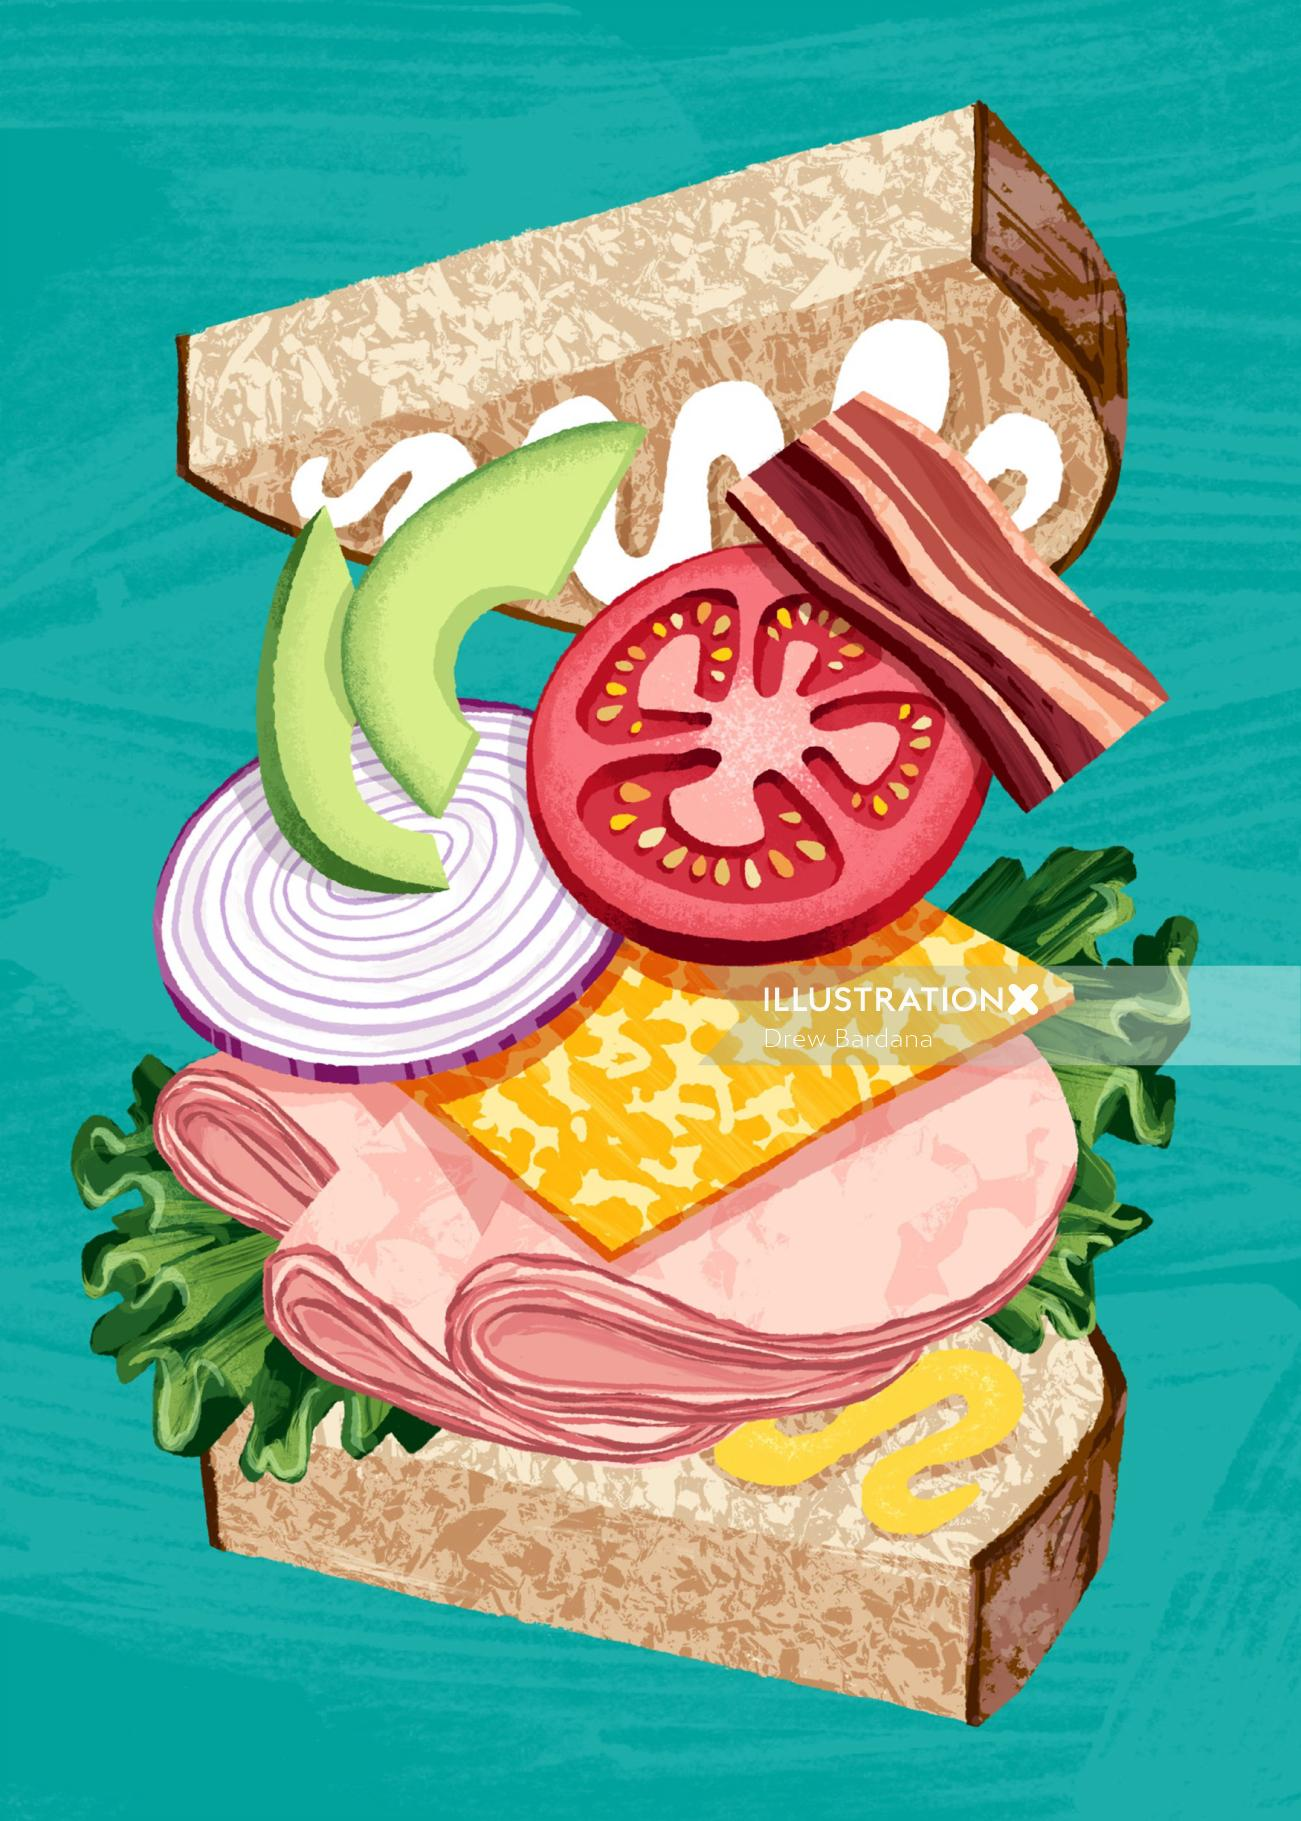 Hand drawn burger illustration